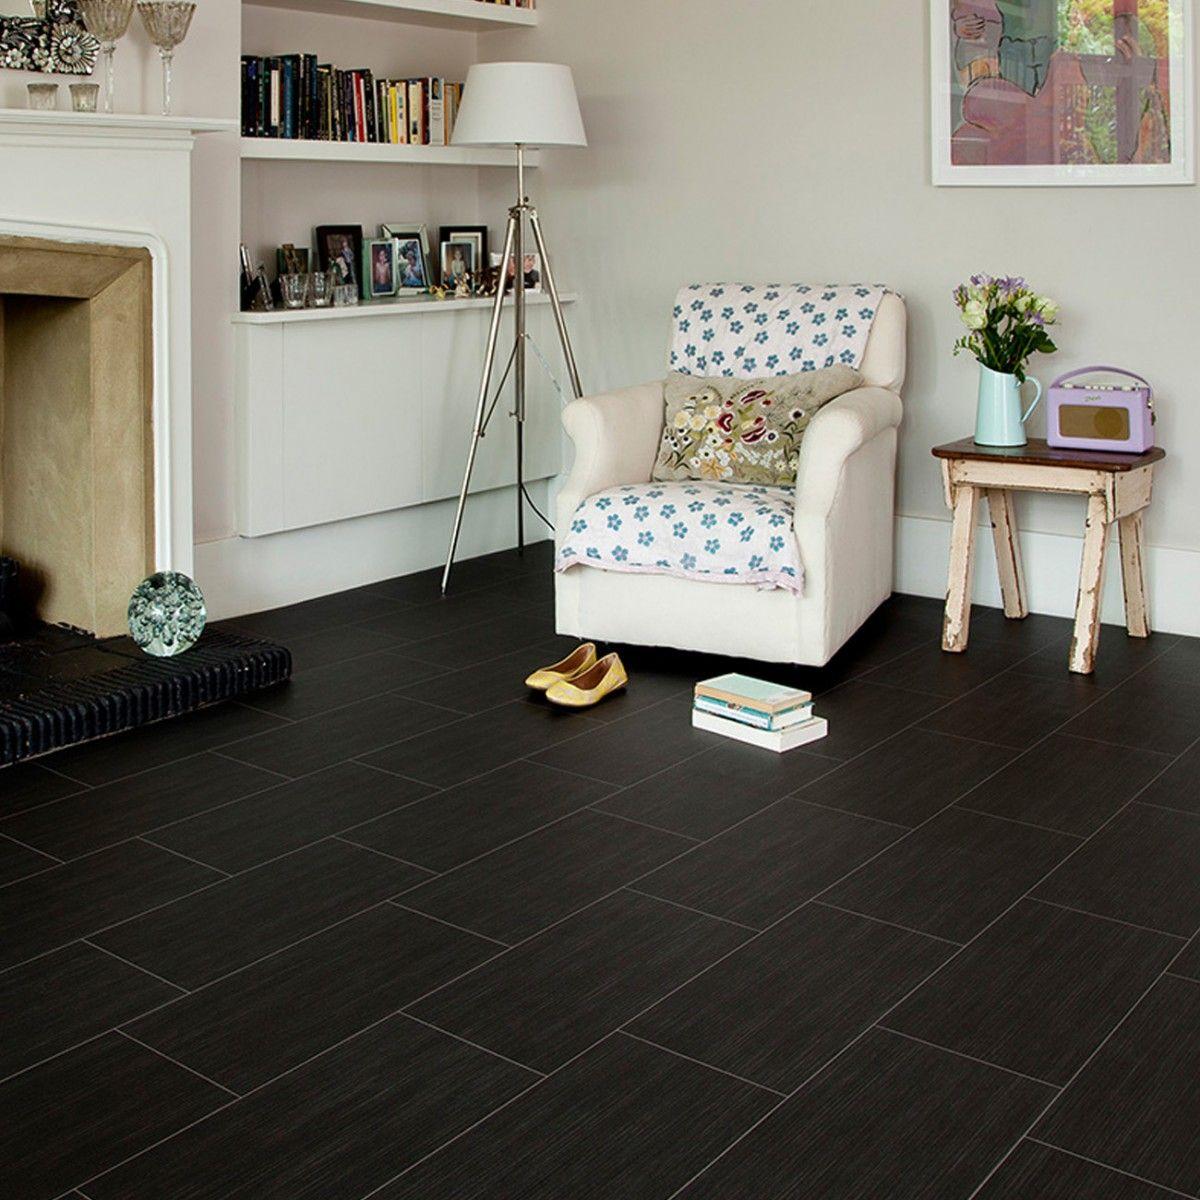 A great vinyl flooring that can endure heavy foot traffic